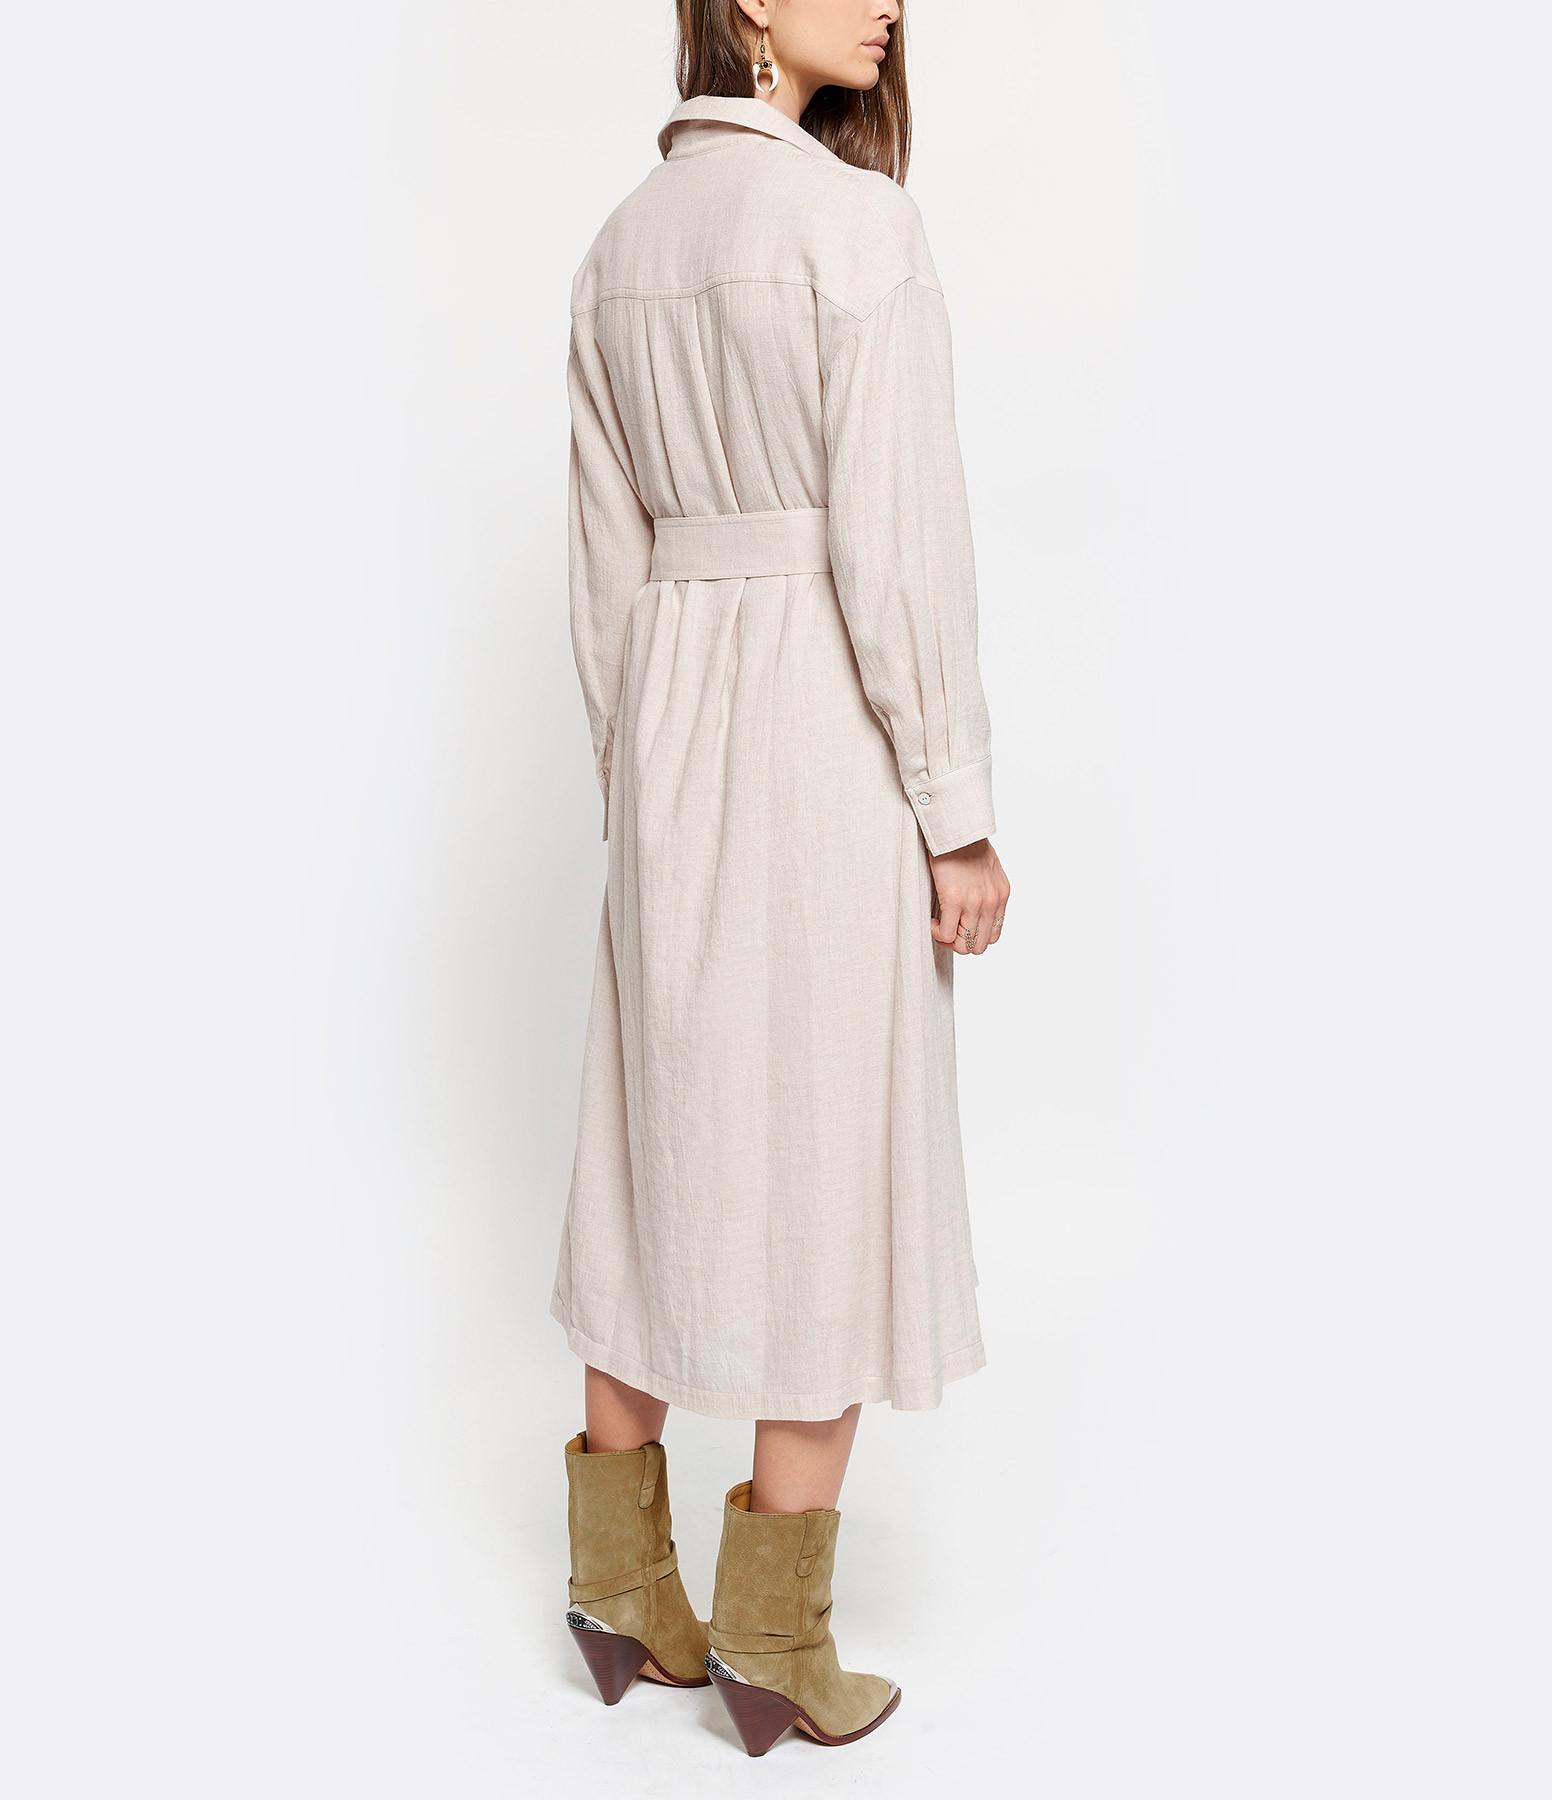 VINCE - Robe Ceinturée Beige Avoine